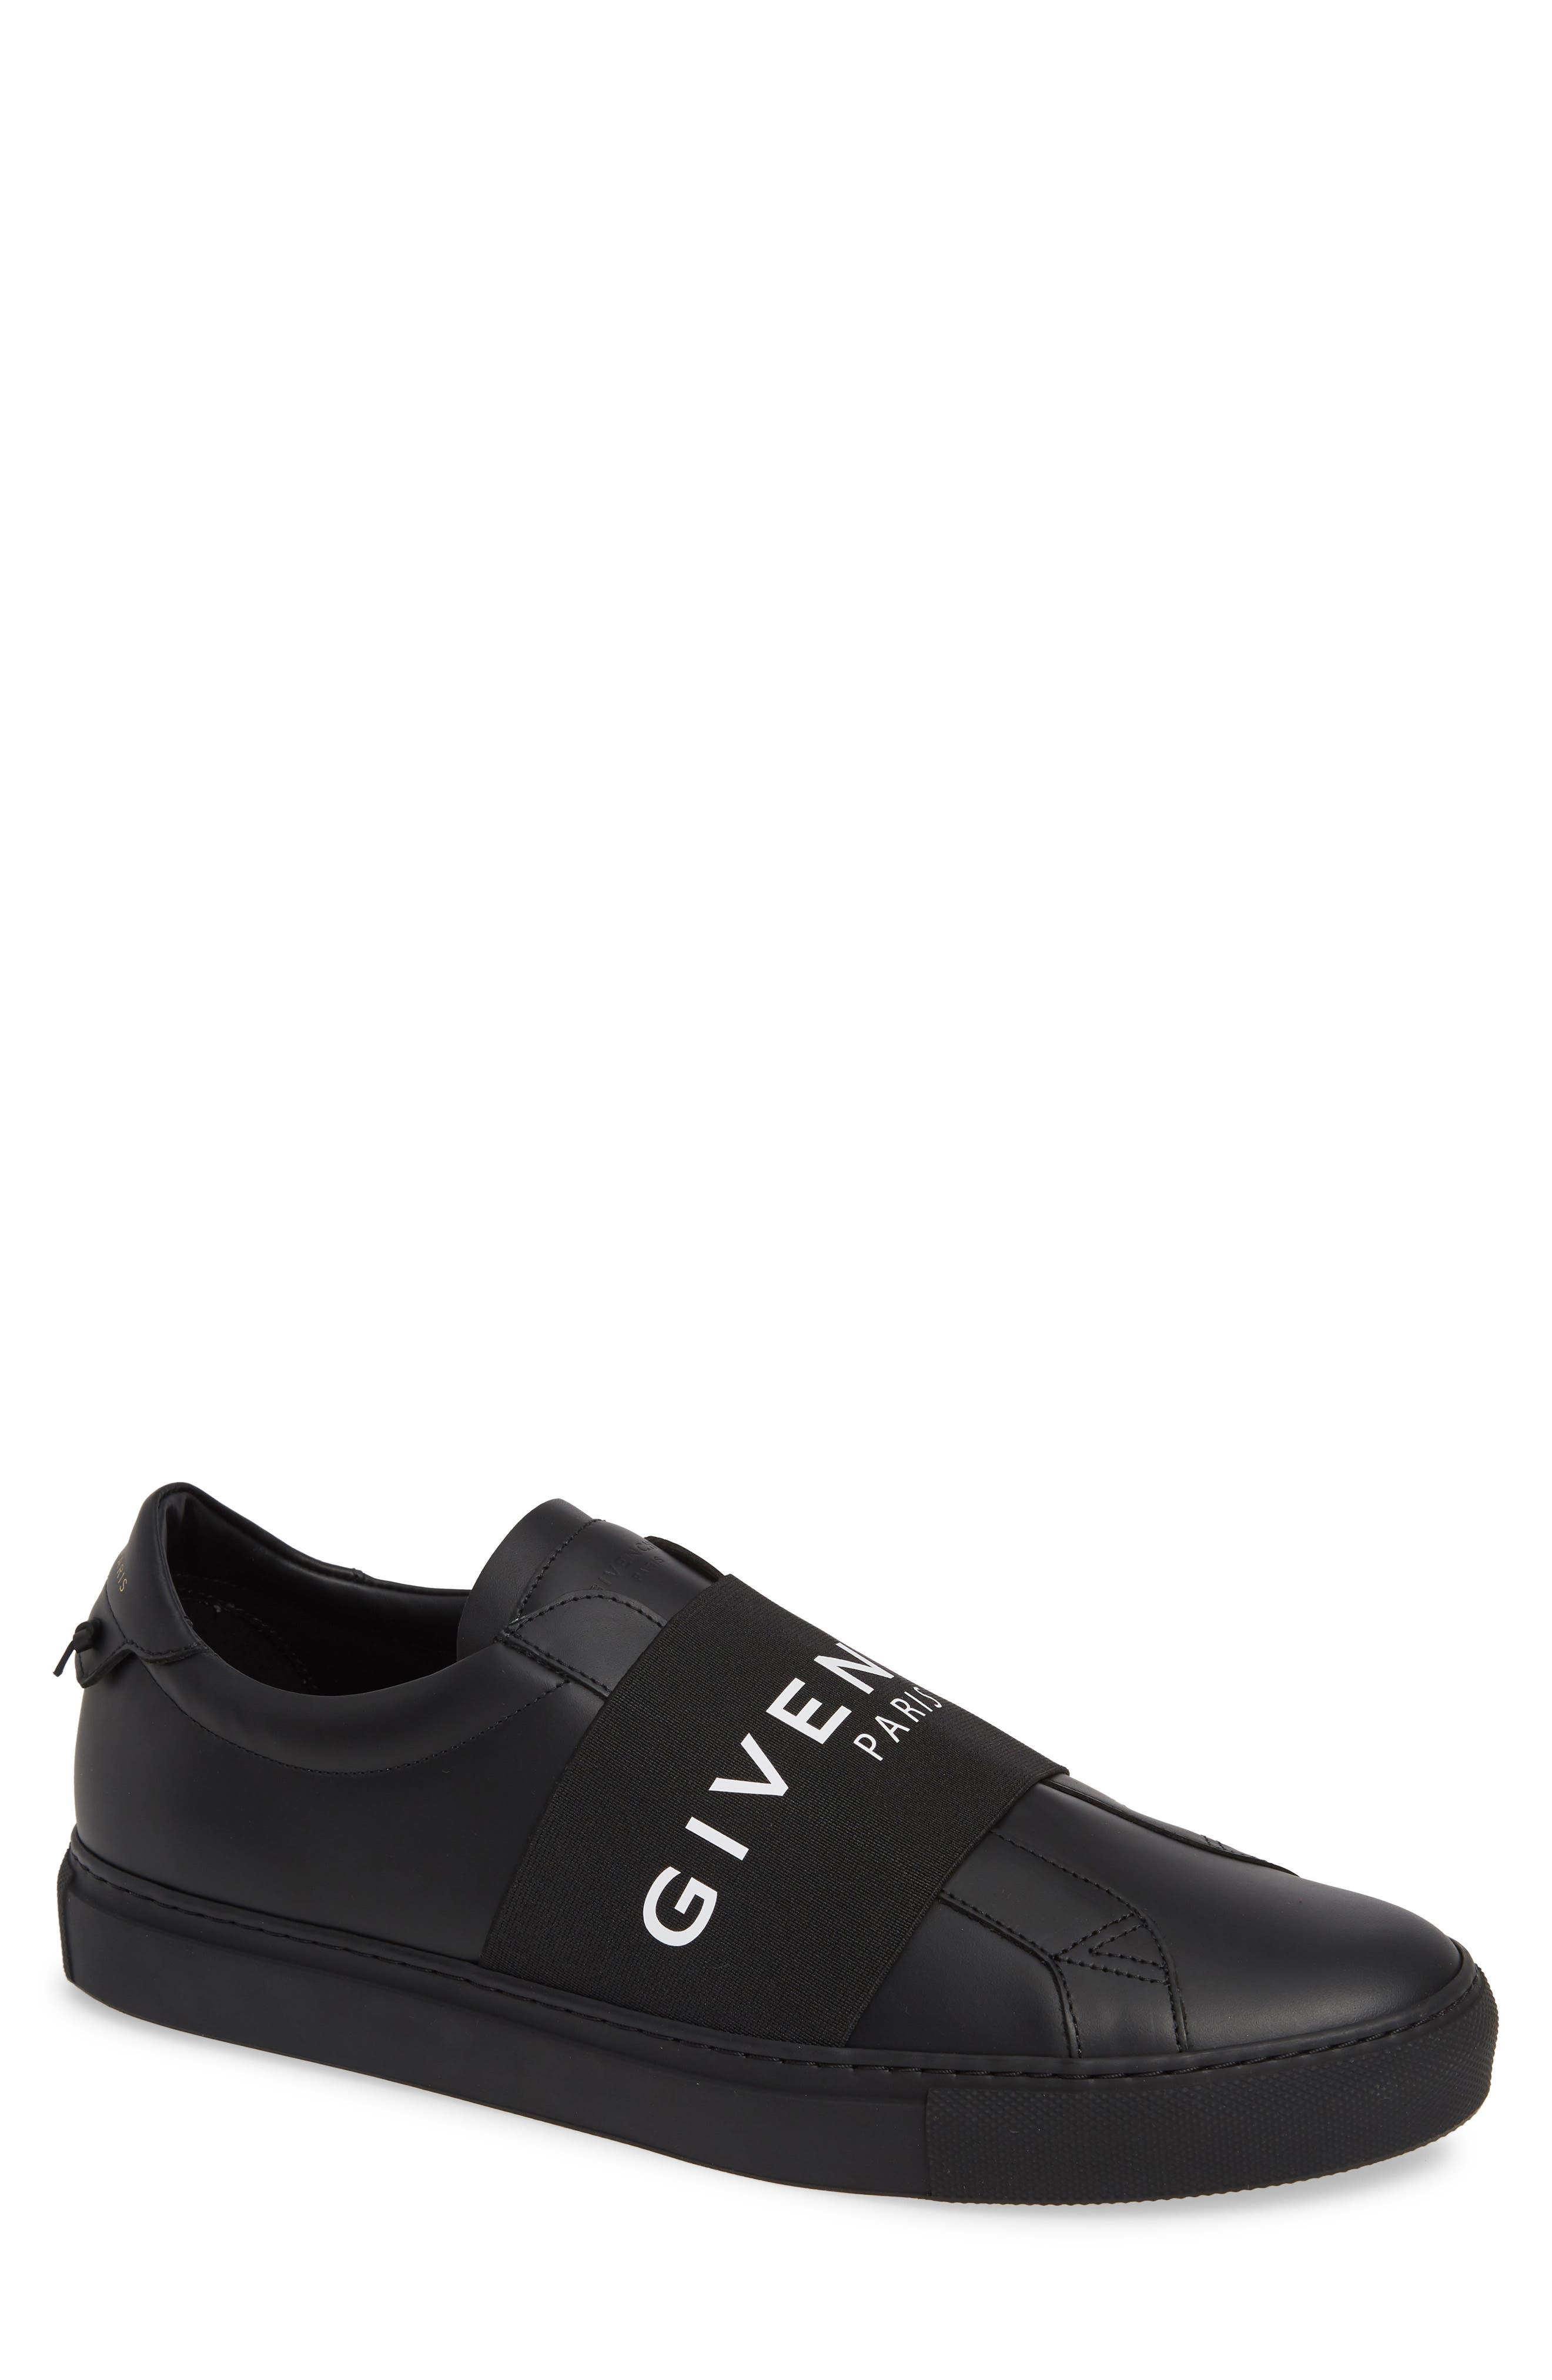 GIVENCHY Urban Knots Sneaker, Main, color, BLACK